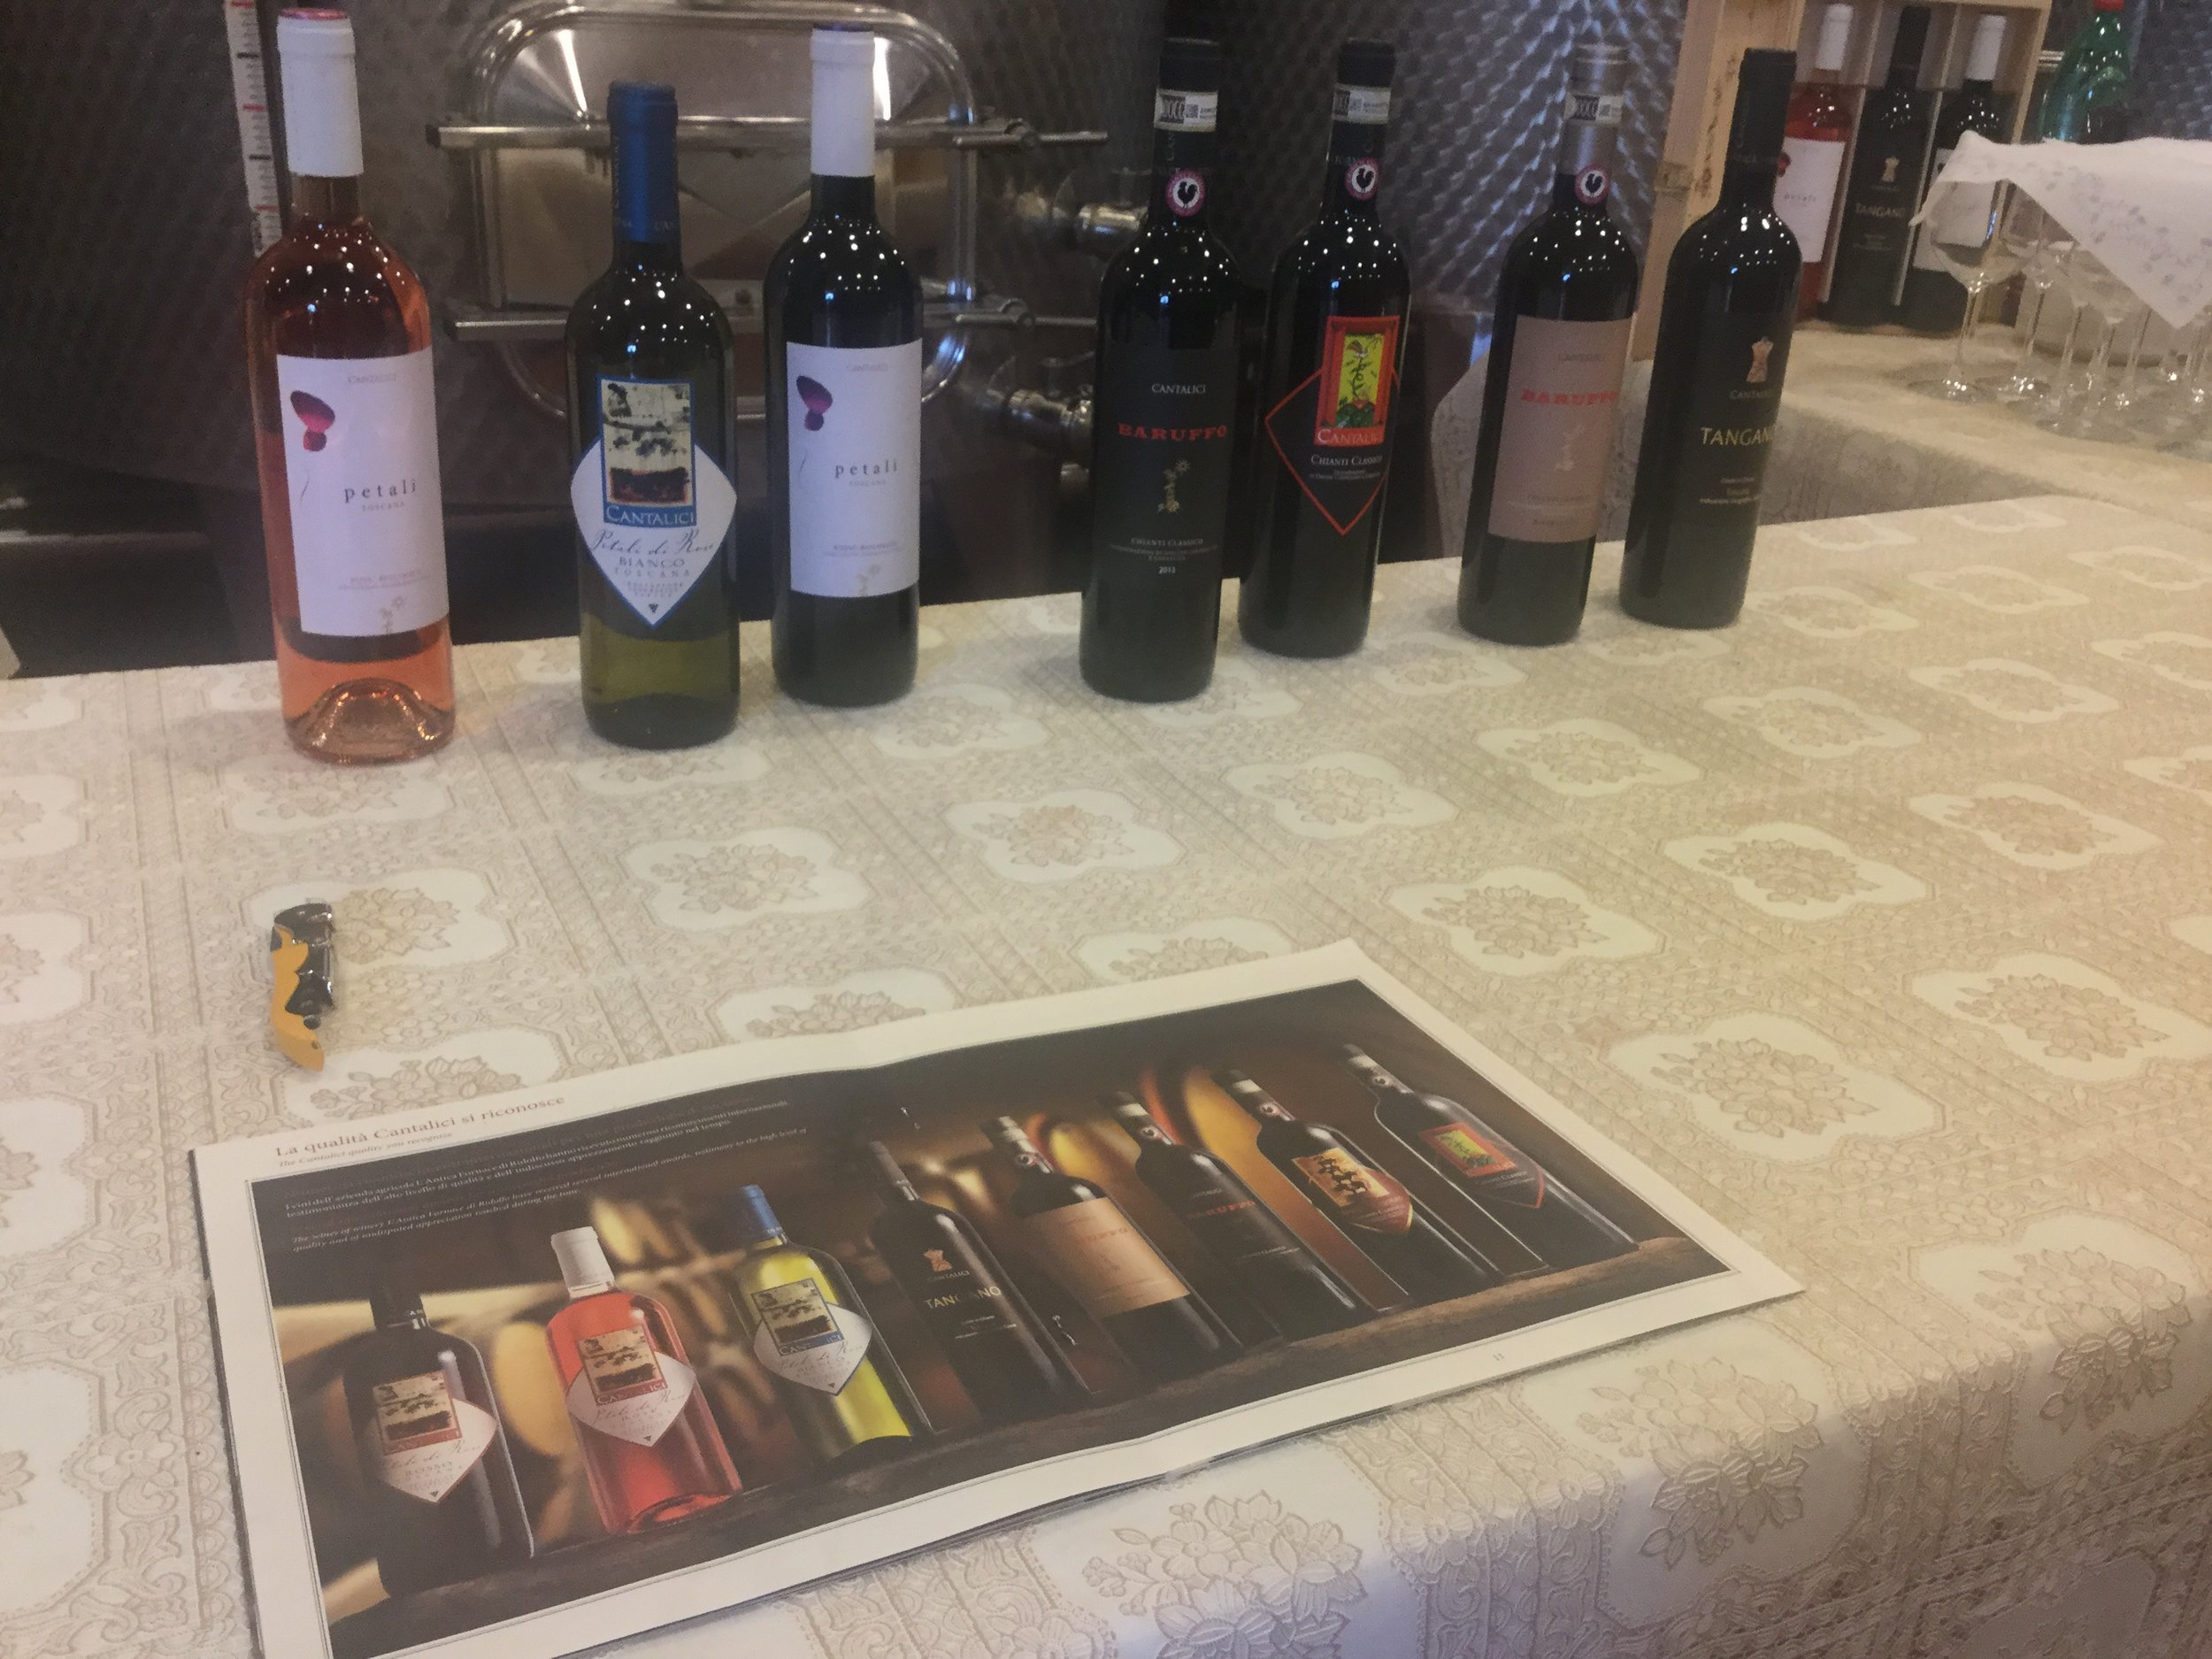 chianti-wine-tasting_26876801369_o.jpg